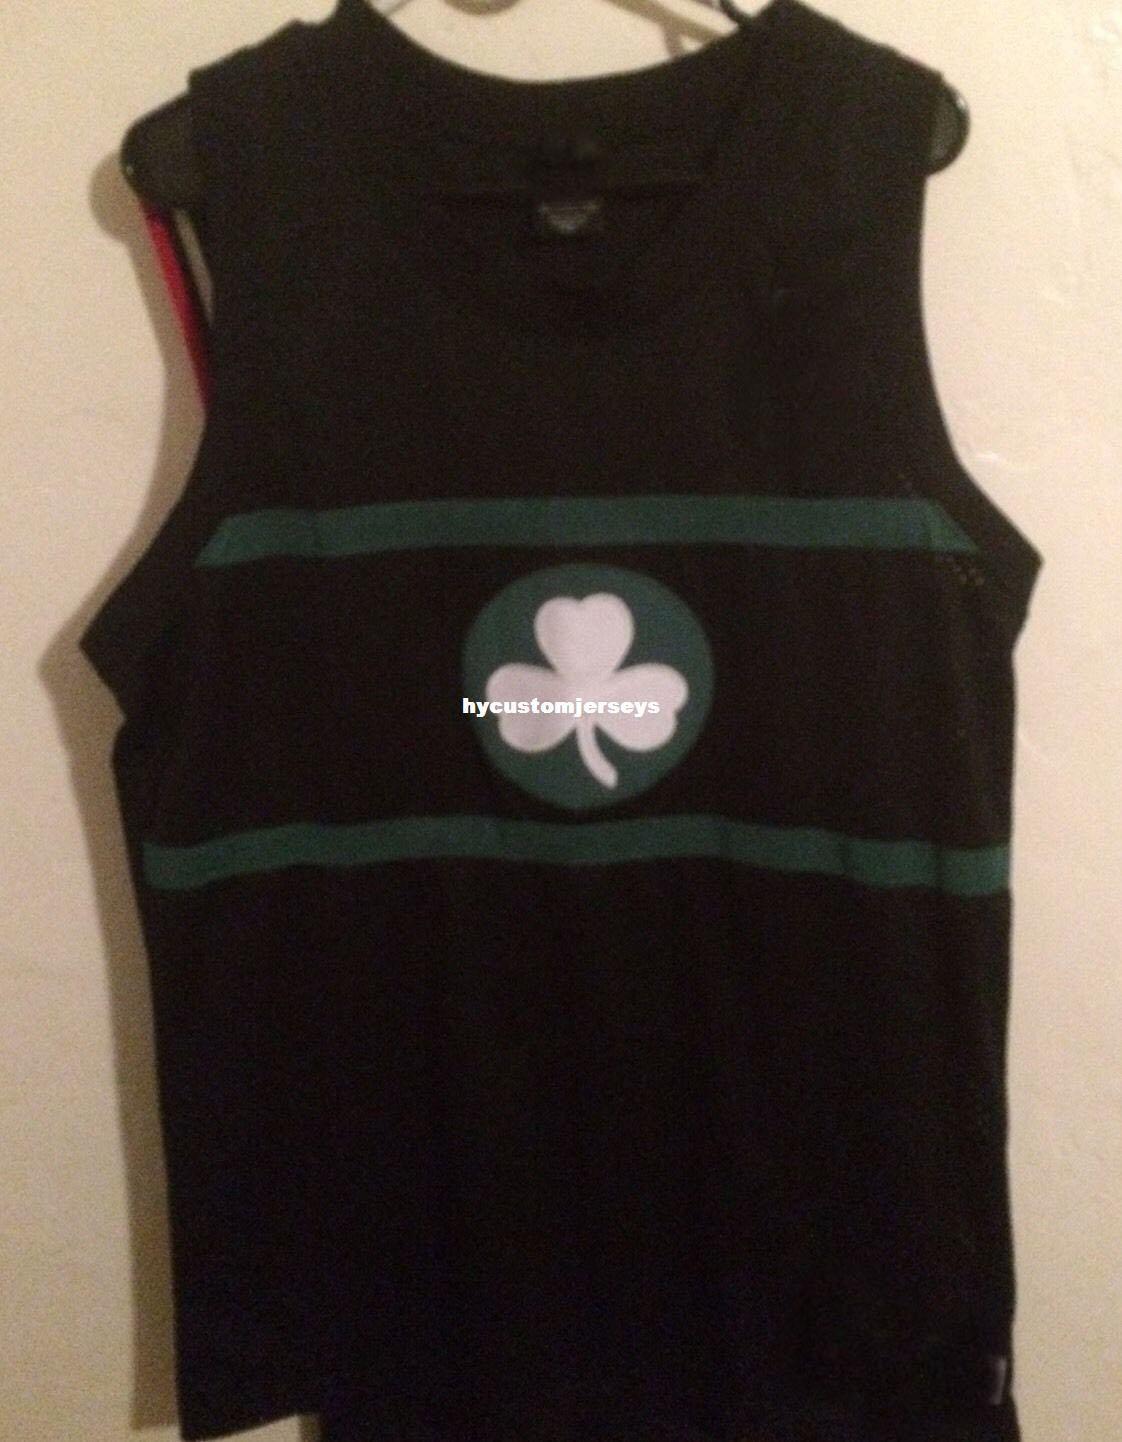 Baratos por atacado Paul Pierce nk Costurado Jersey # 34 Rebobinar Homens T-shirt Preta colete Costurado Basquete jerseys Ncaa